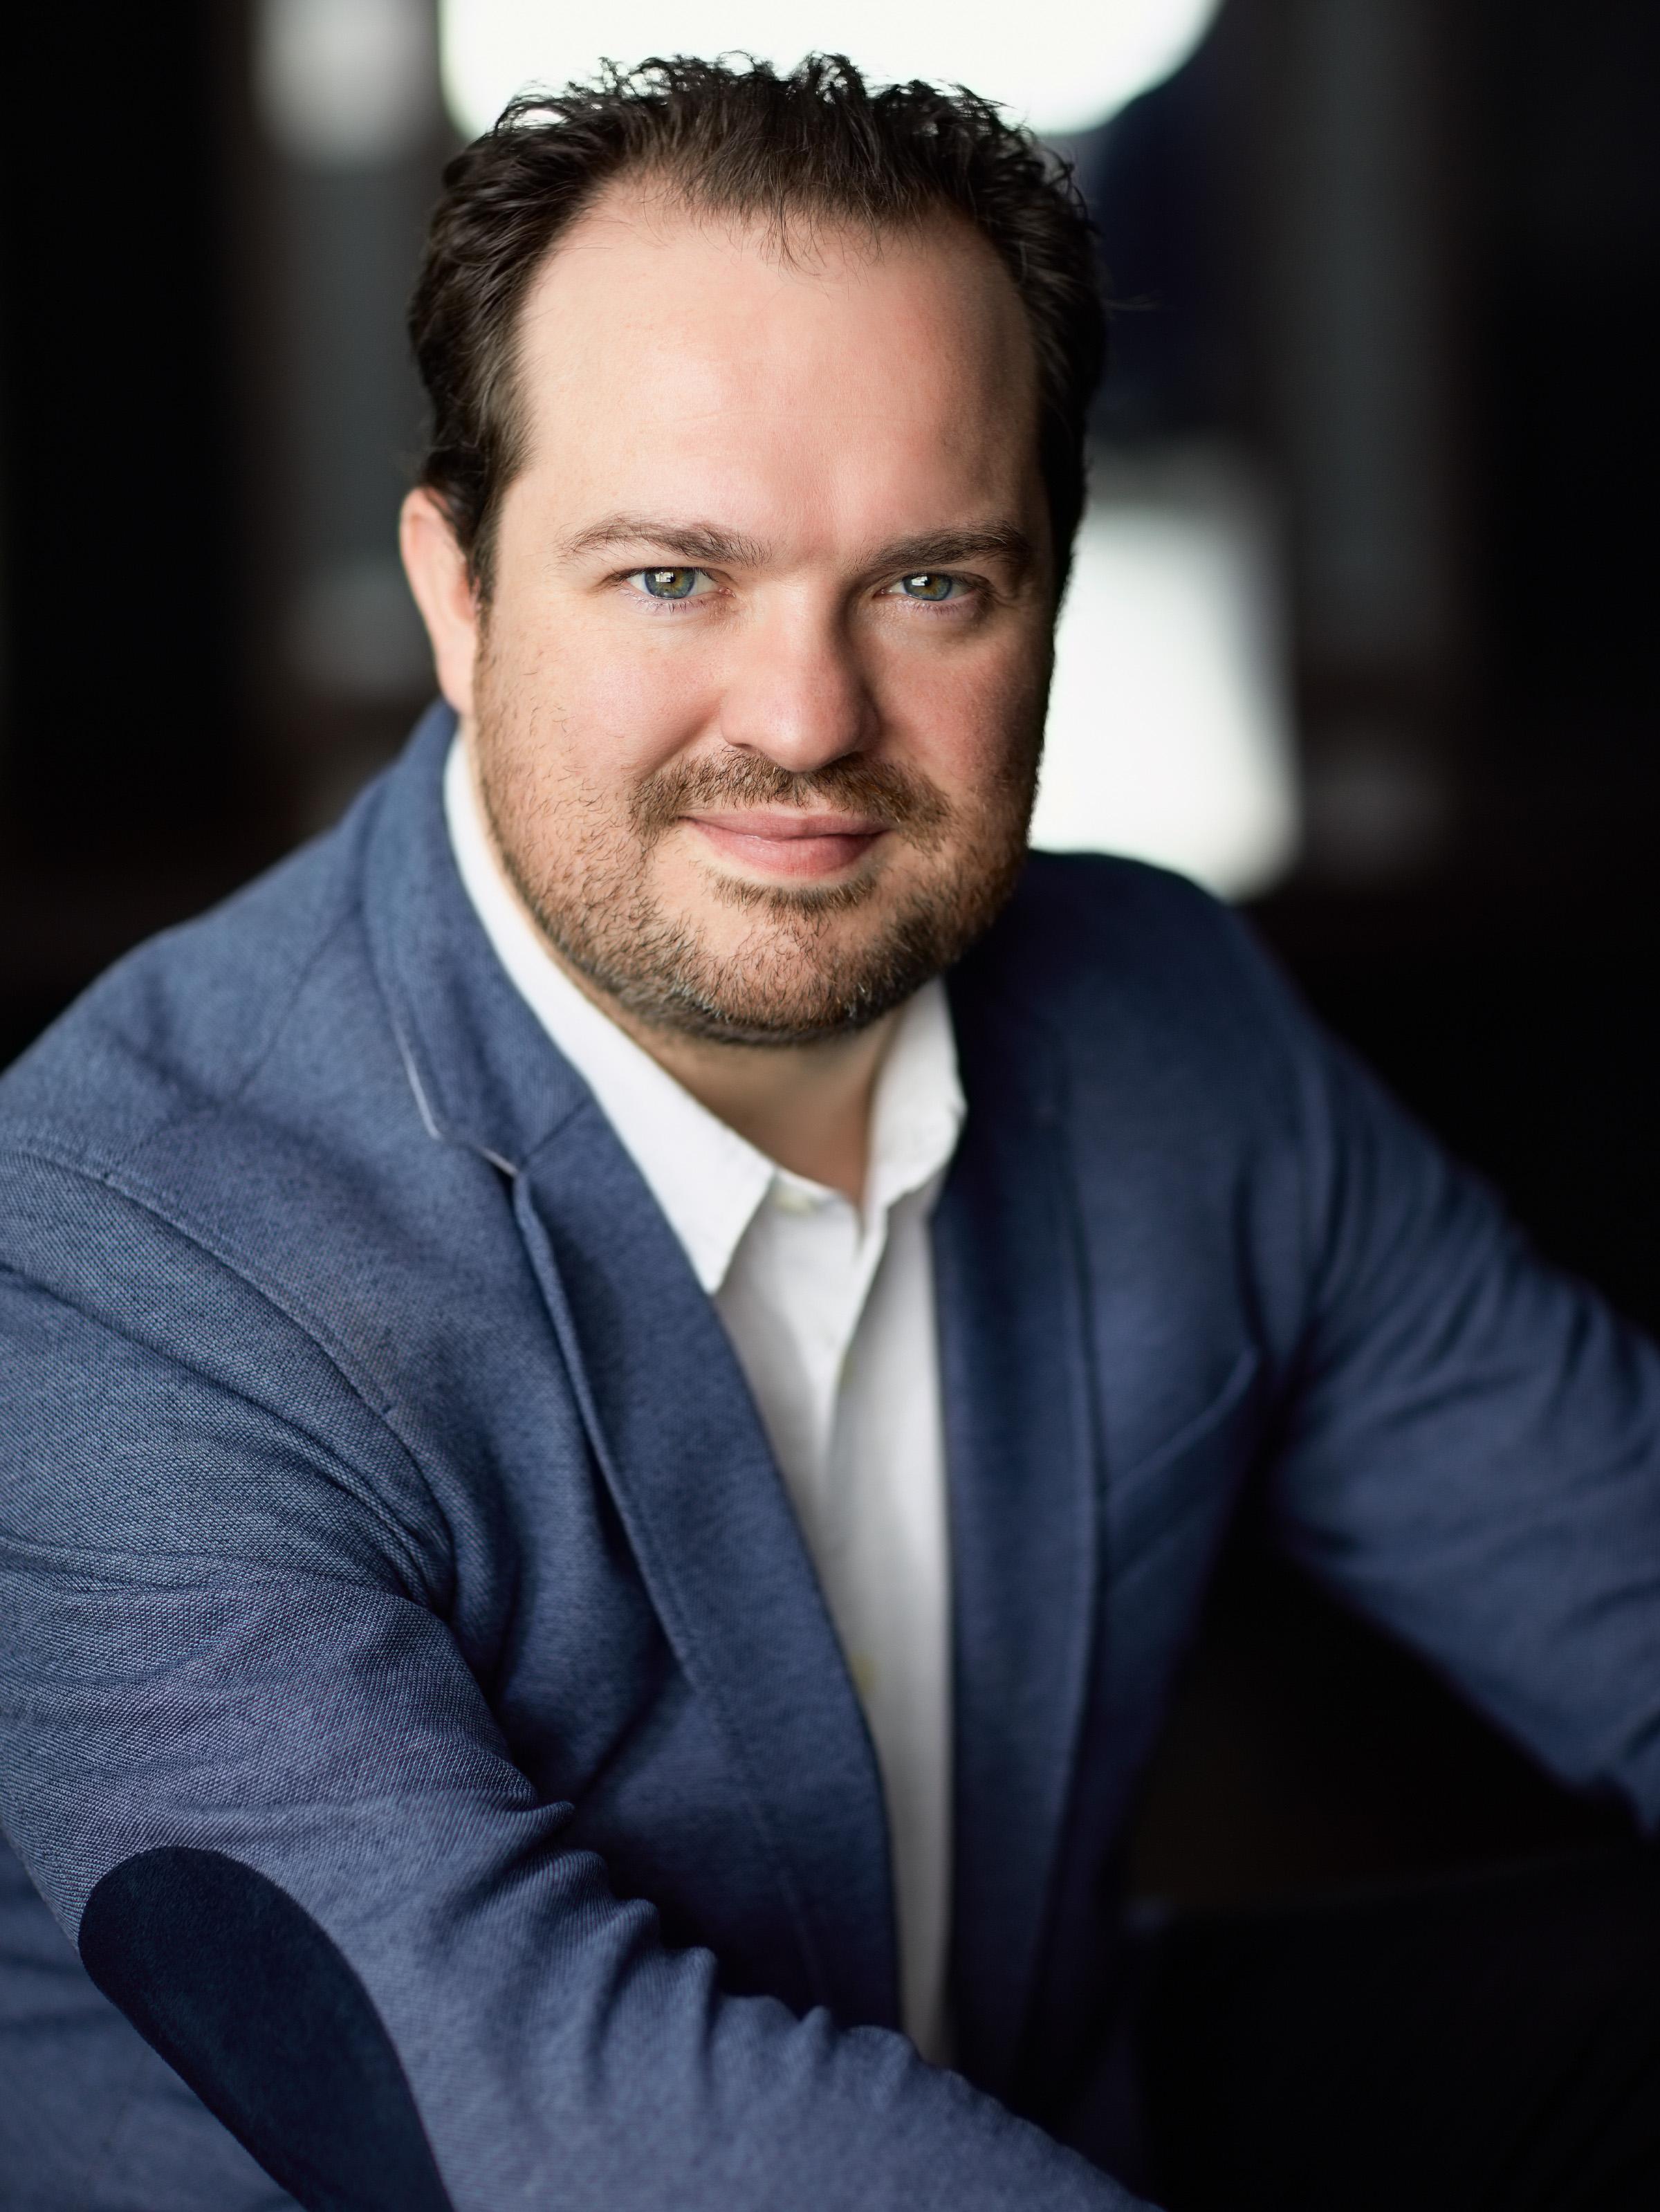 JAMES CUTLER | director